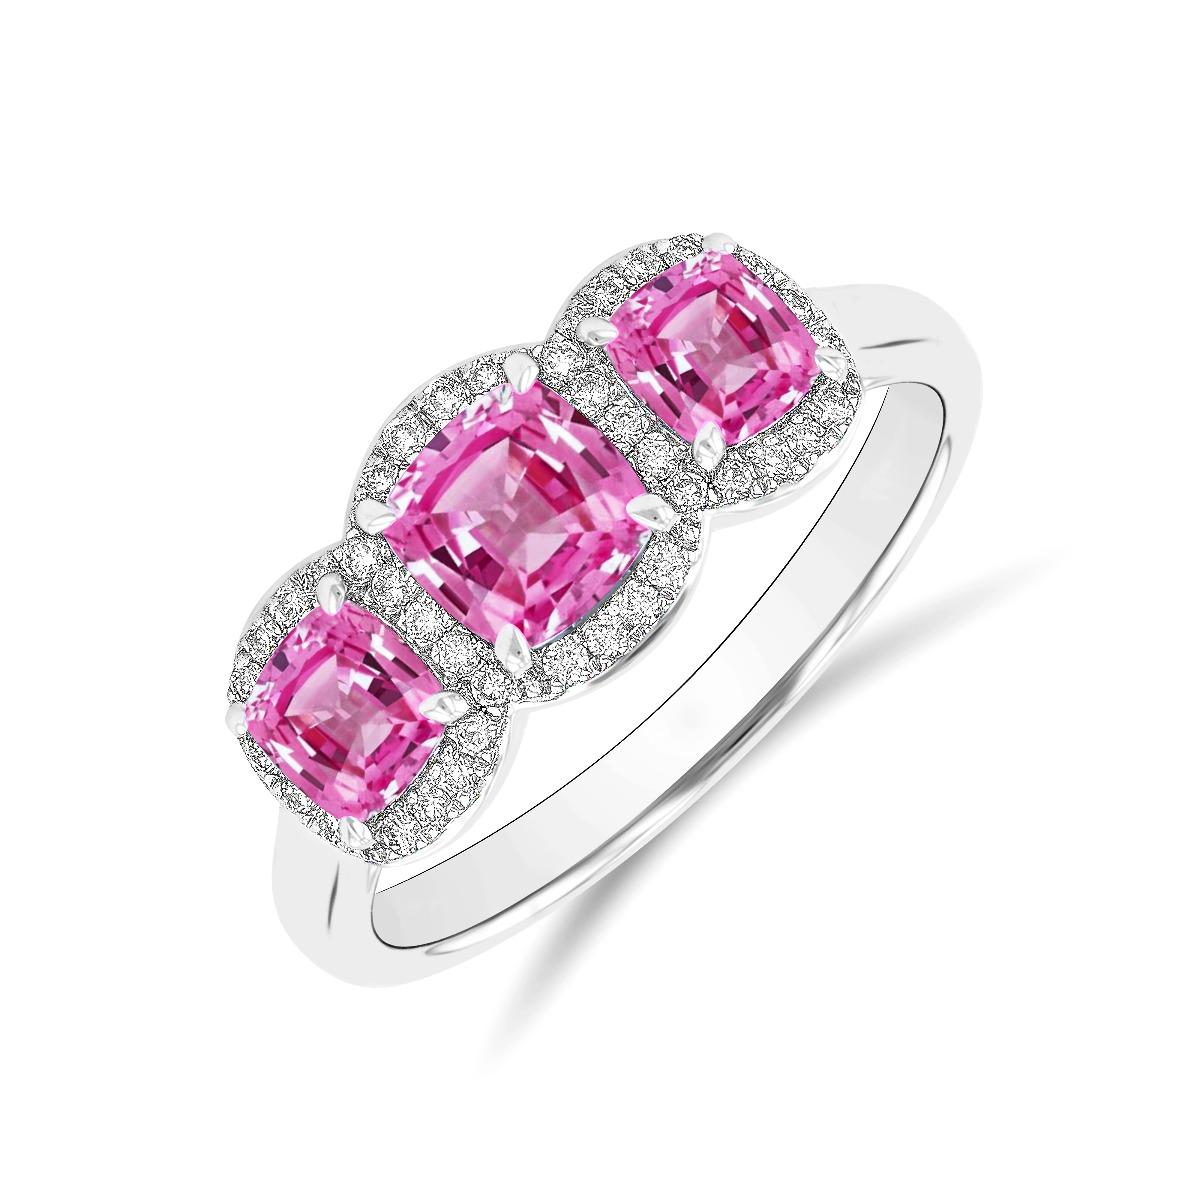 Riviera Collection 1.51ct Pink Sapphire & Diamond Triple Halo Ring   Platinum